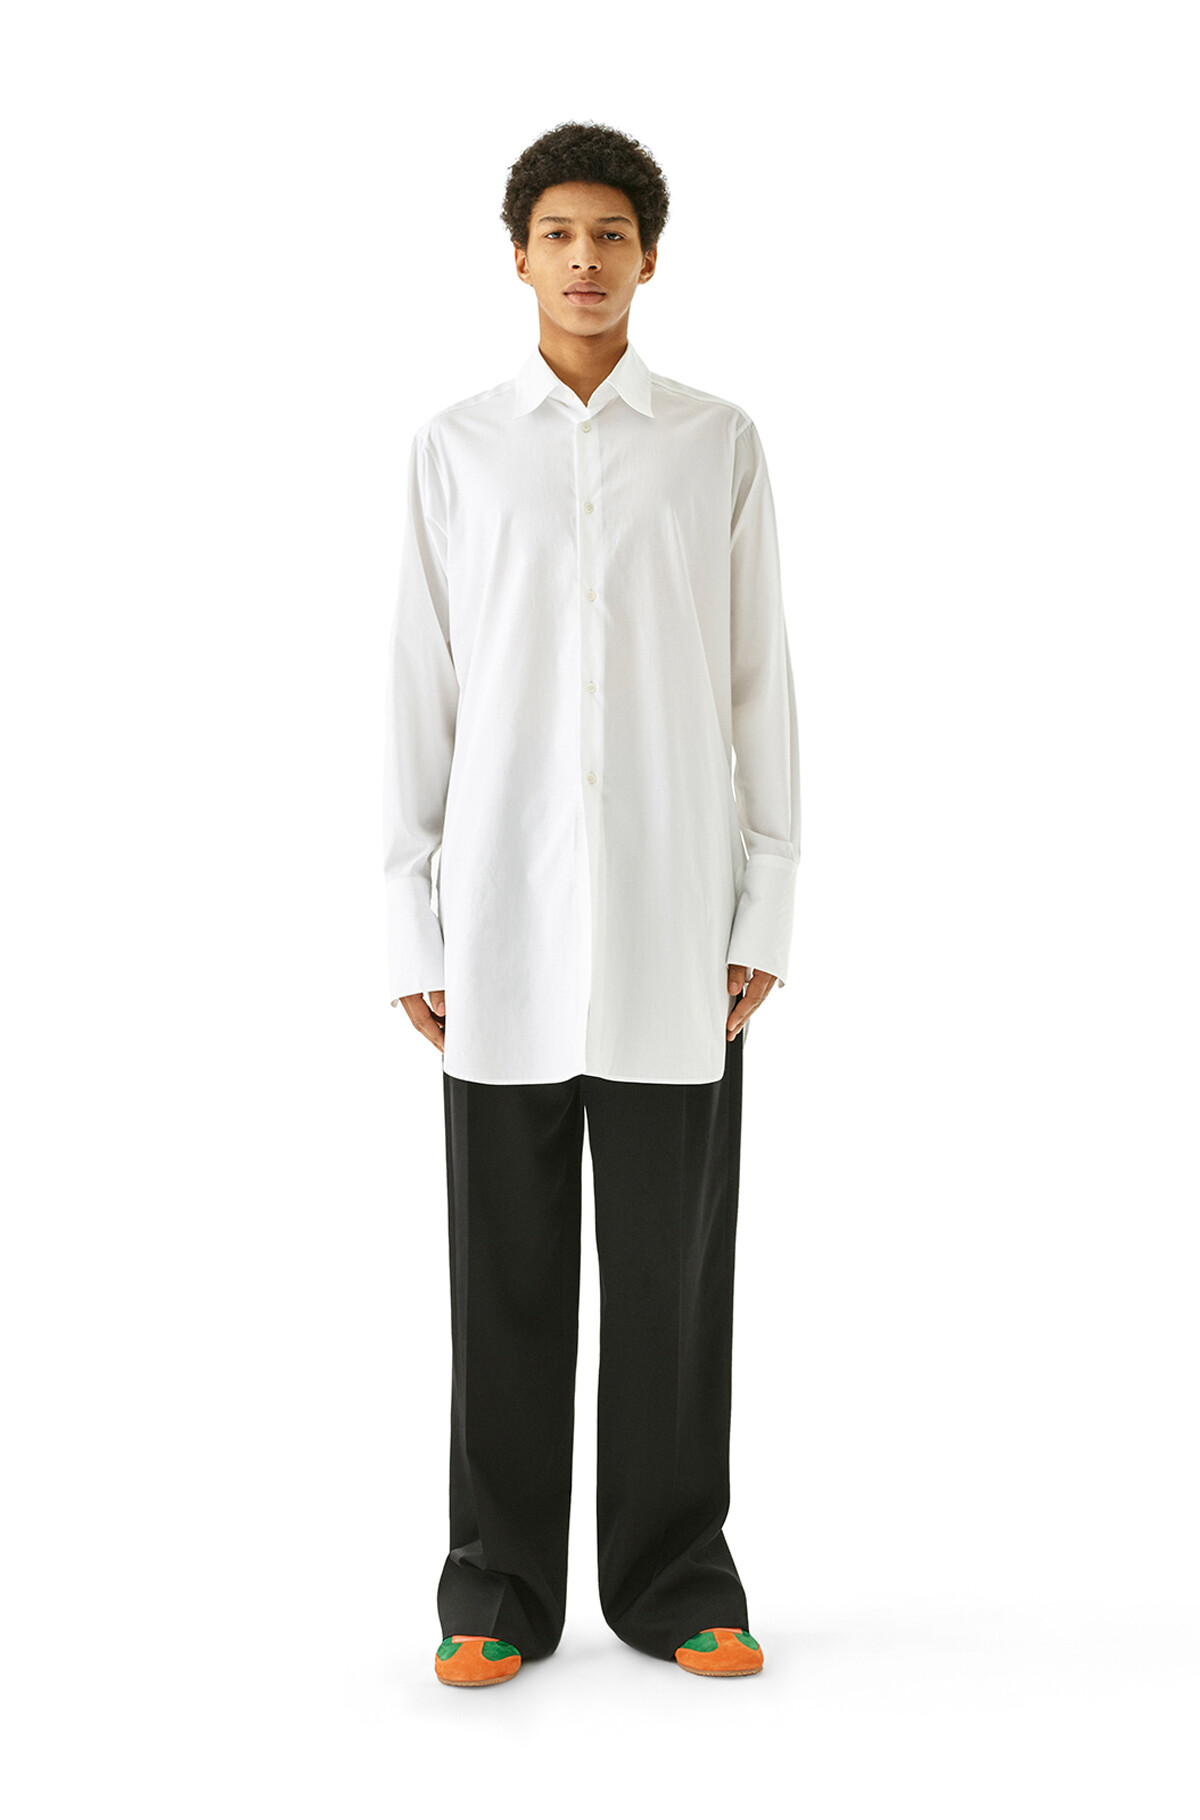 LOEWE 超大号有领衬衫 白色 front